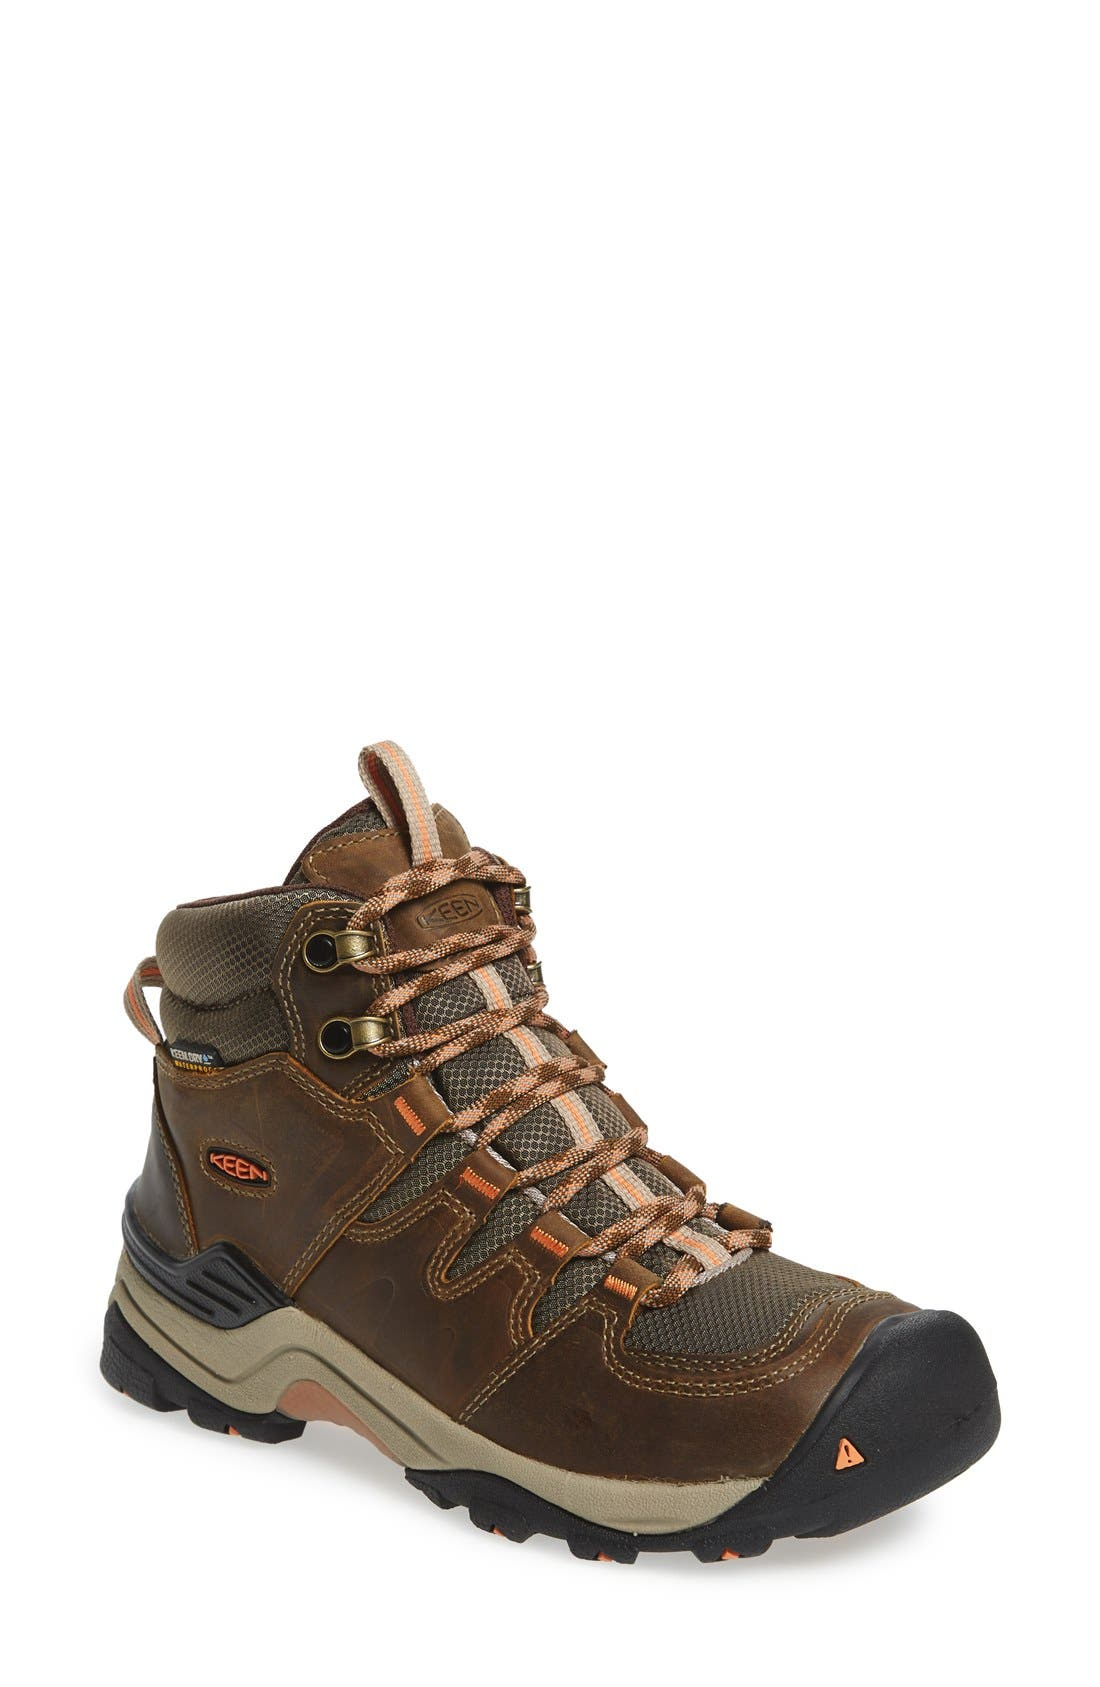 Gypsum II Mid Waterproof Hiking Boot,                             Main thumbnail 1, color,                             CORNSTOCK/ GOLD CORAL